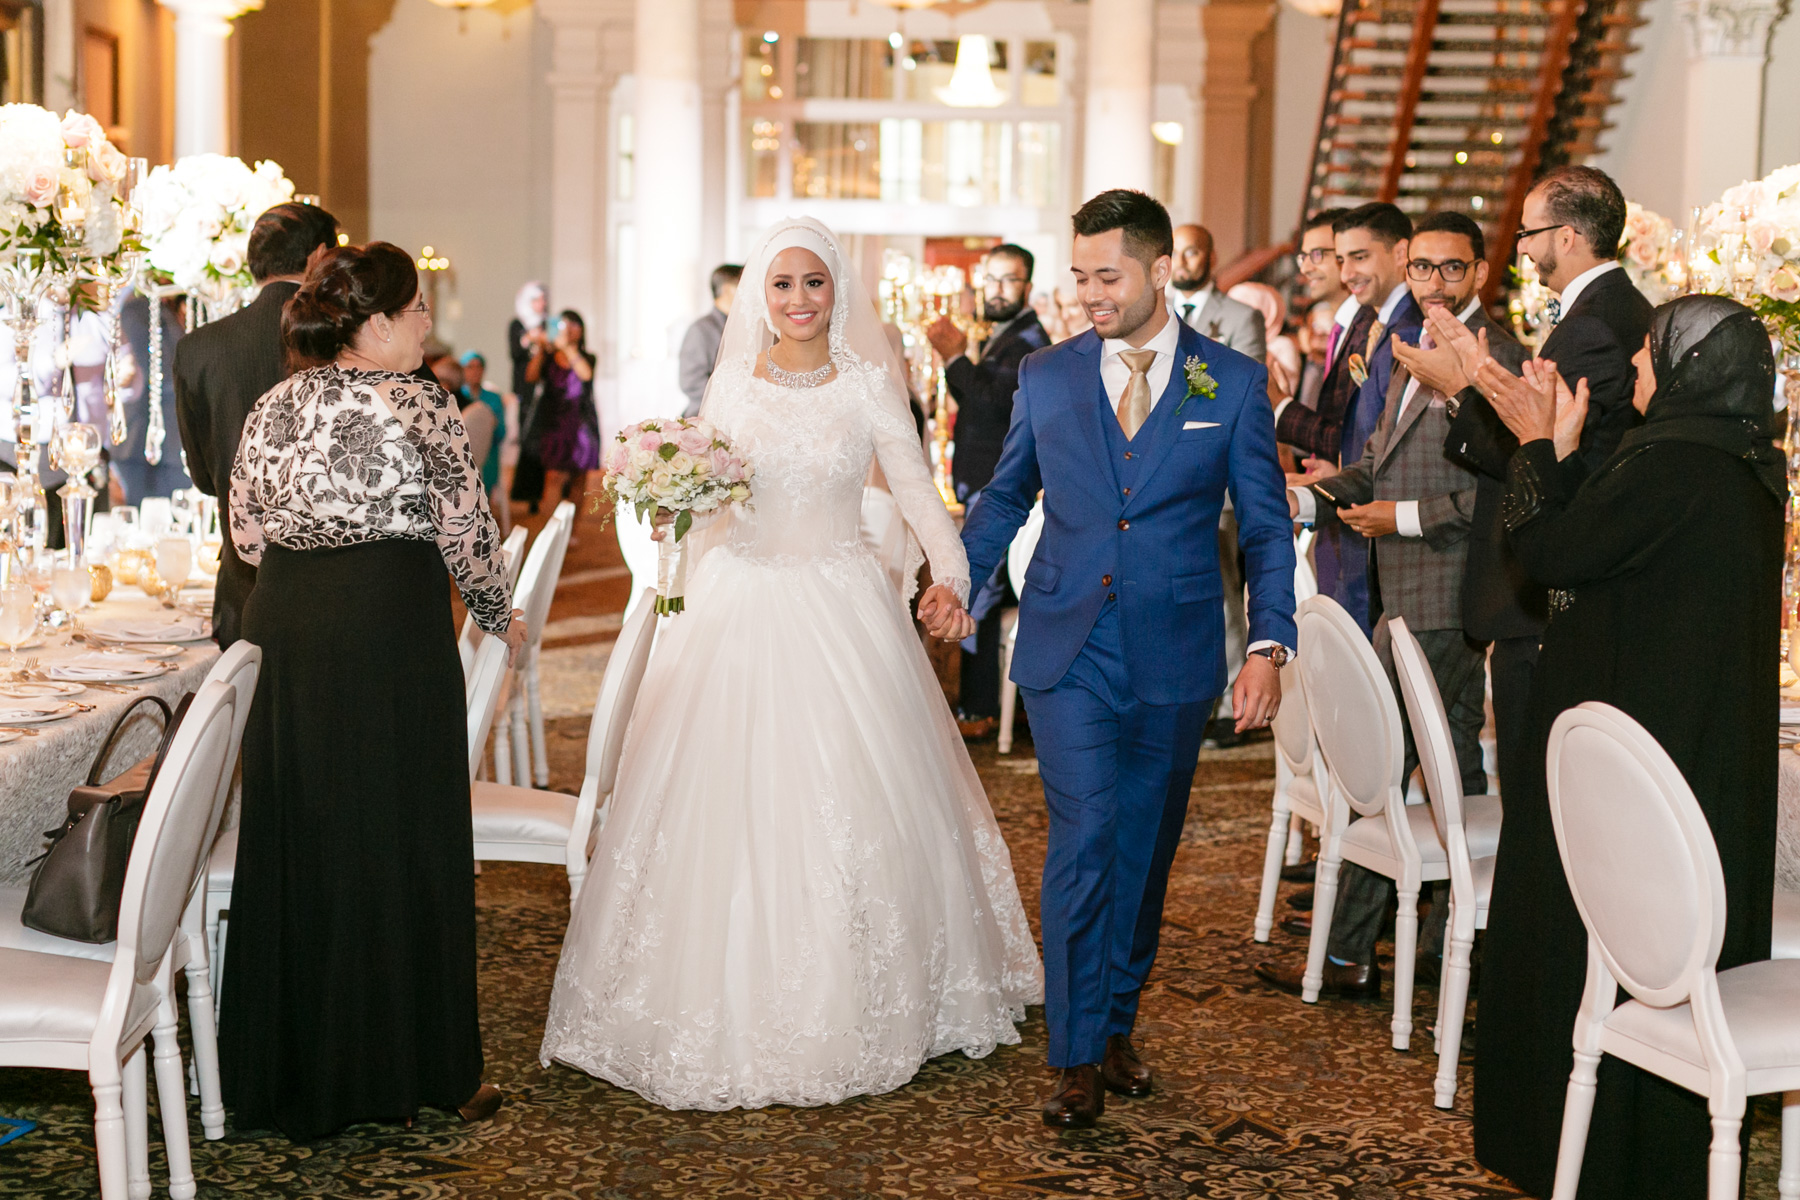 joeewong-ayad-liberty-grand-toronto-wedding-217